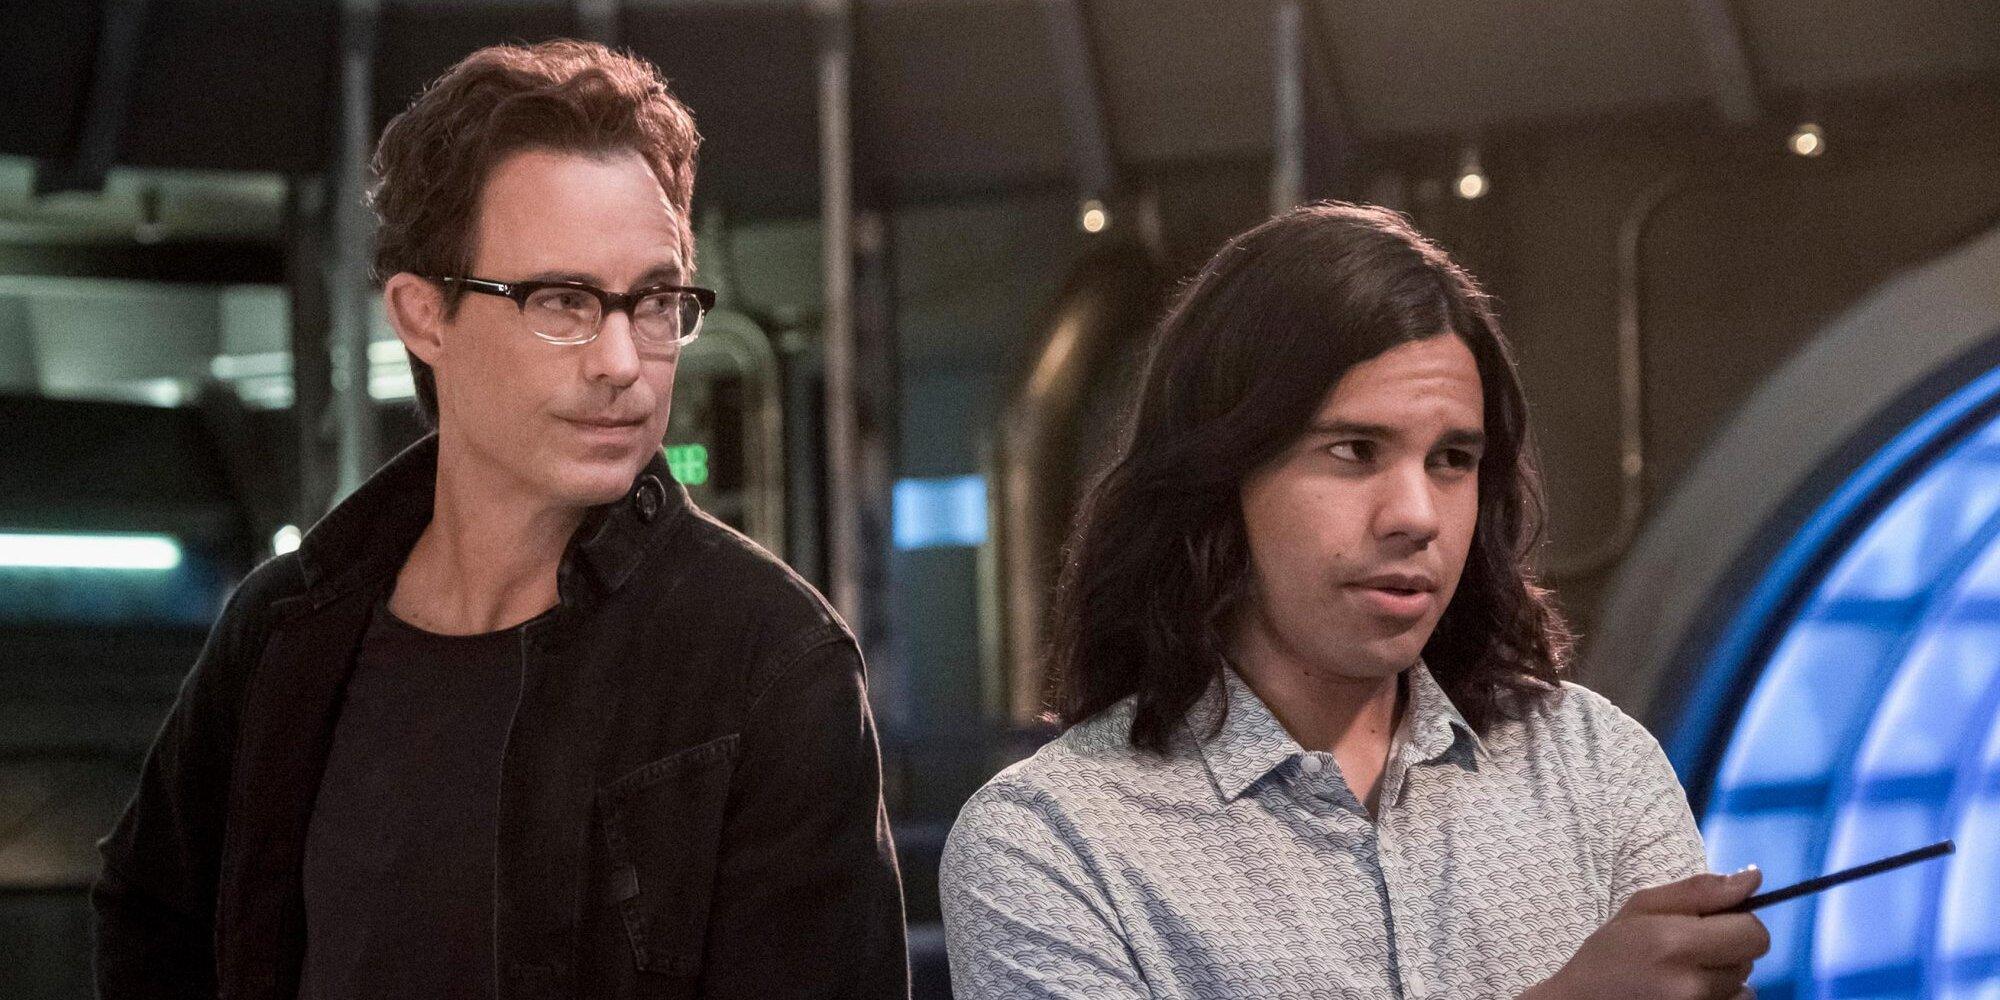 Carlos Valdes and Tom Cavanagh exiting The Flash as series regulars after 7 seasons.jpg